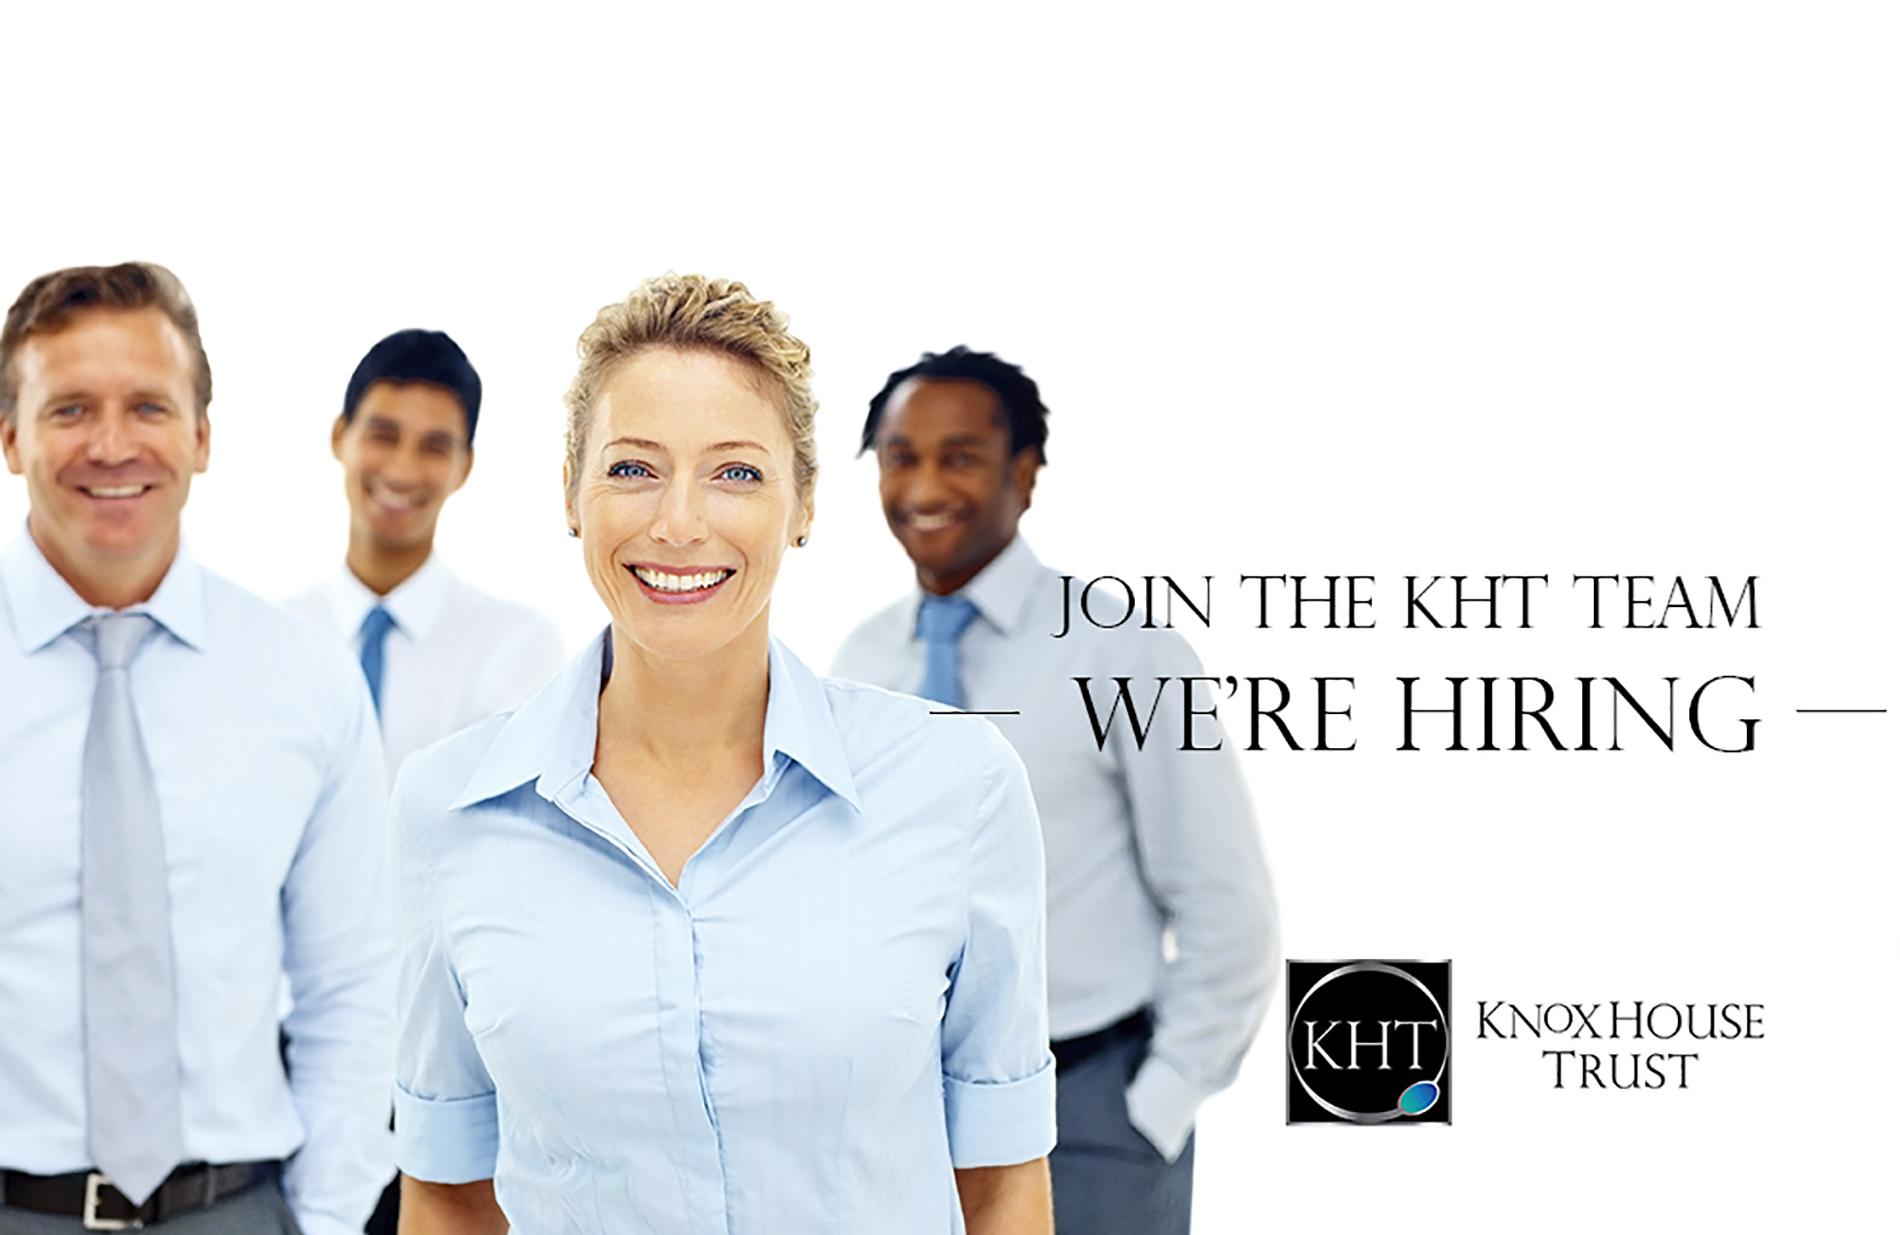 KHT are hiring